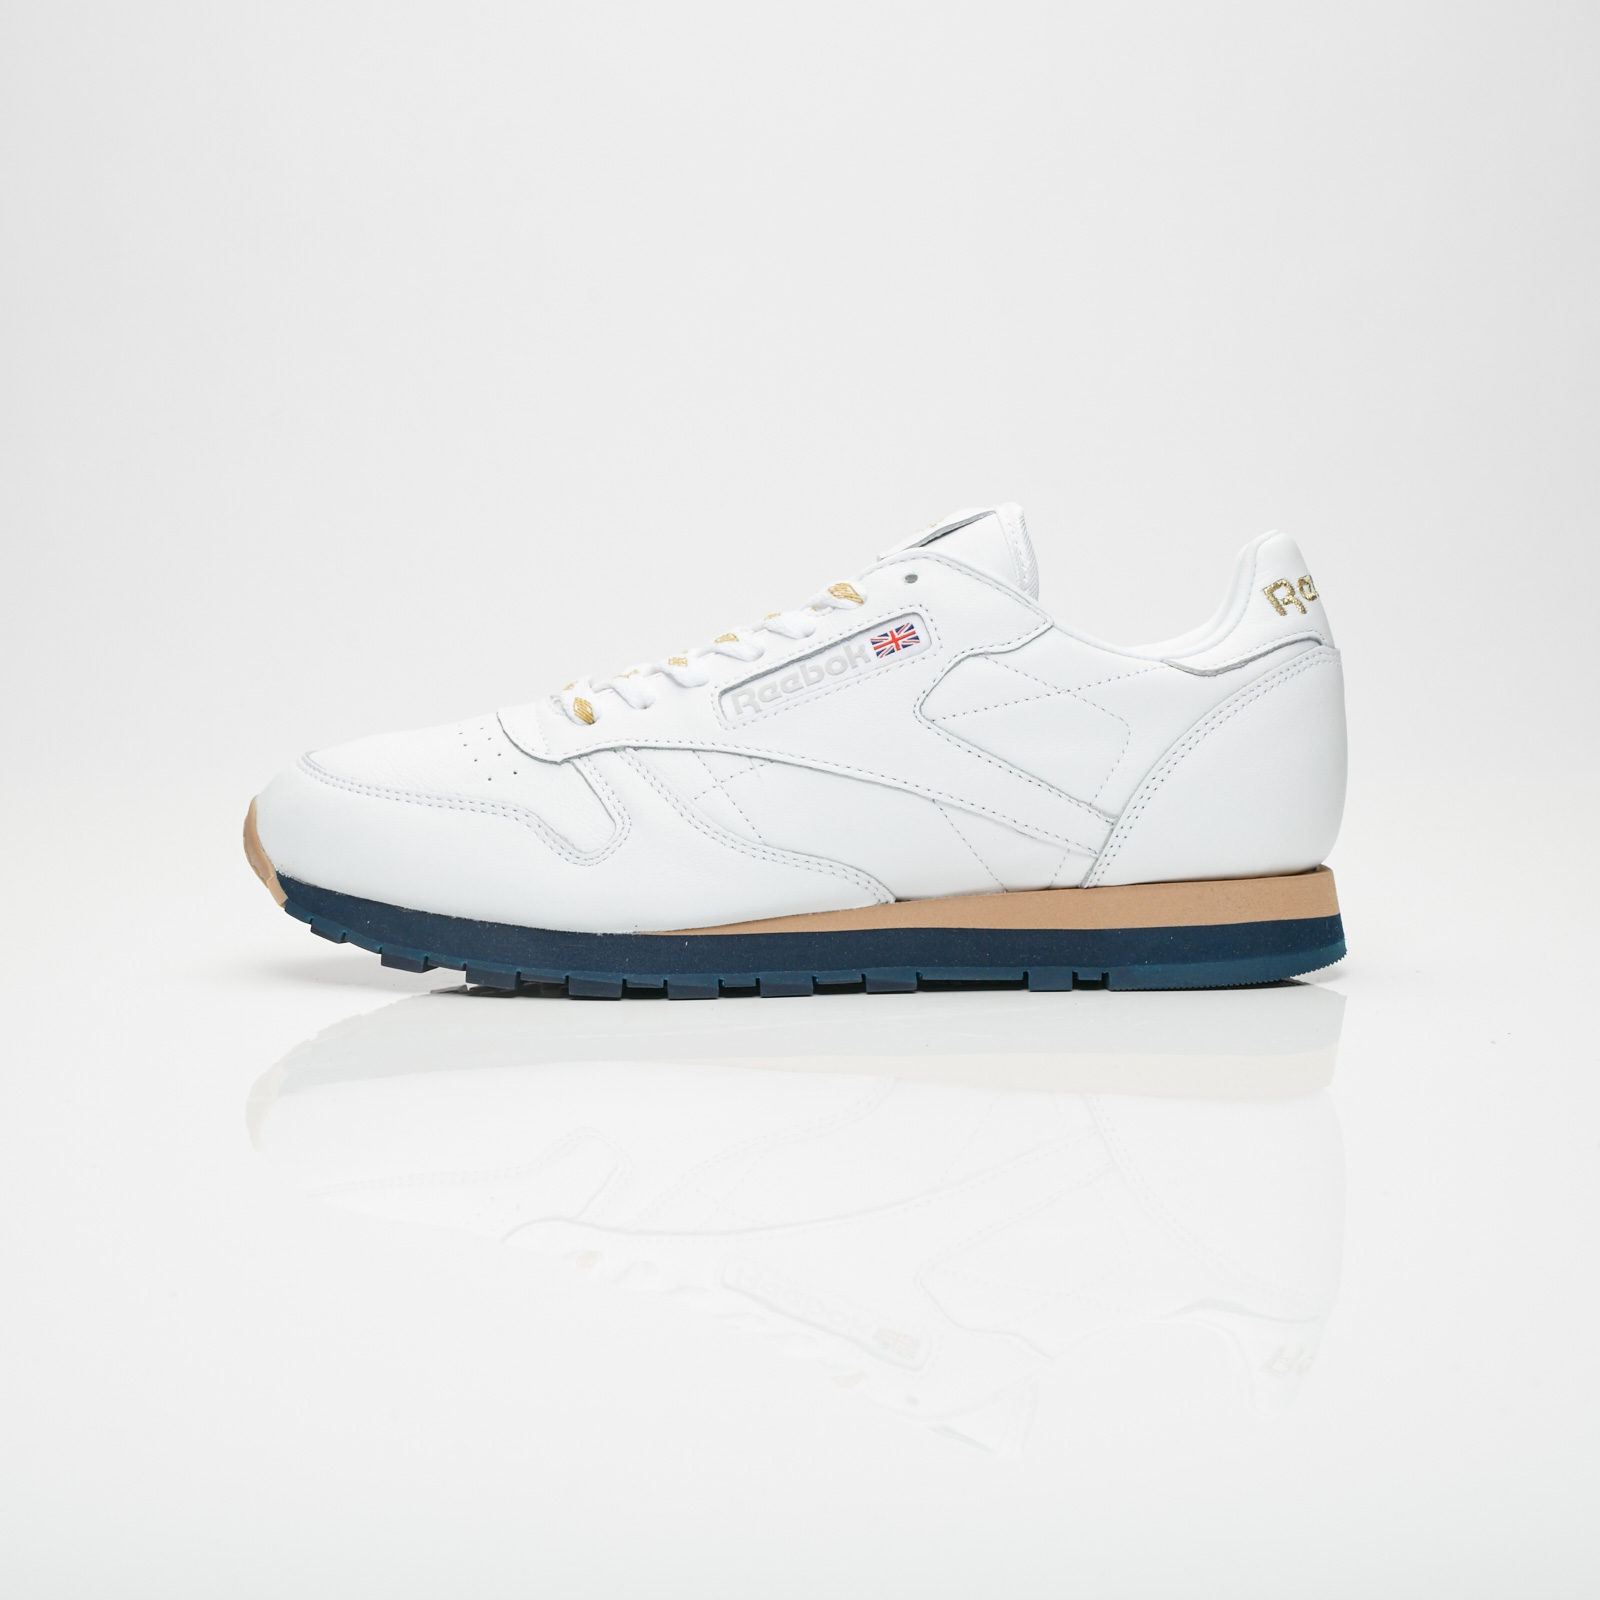 5bd6835e666e Reebok Cl Leather Beams - Cn2175 - Sneakersnstuff